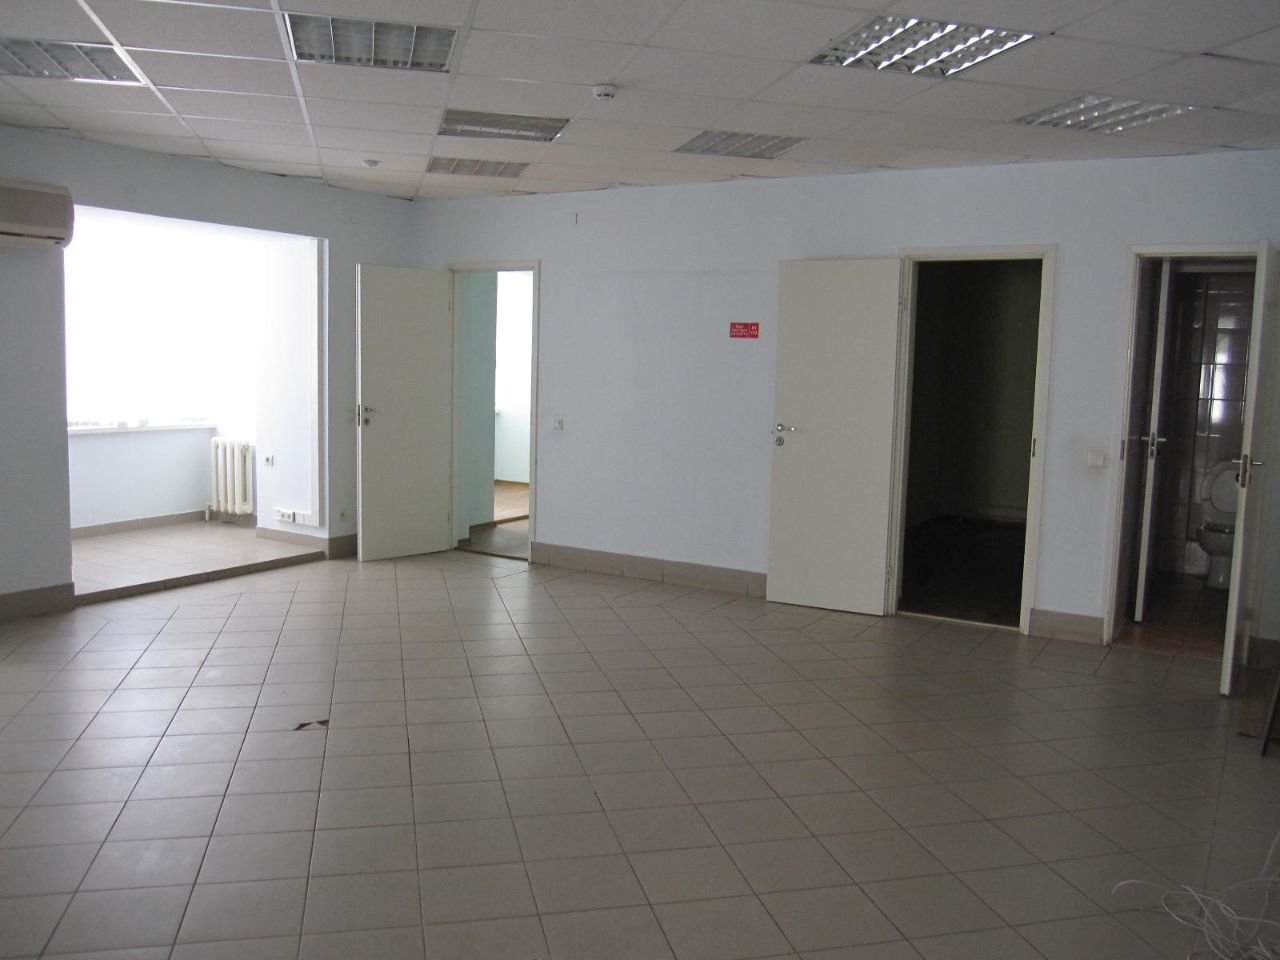 аренда помещений в БЦ на ул. Ленина, 23А